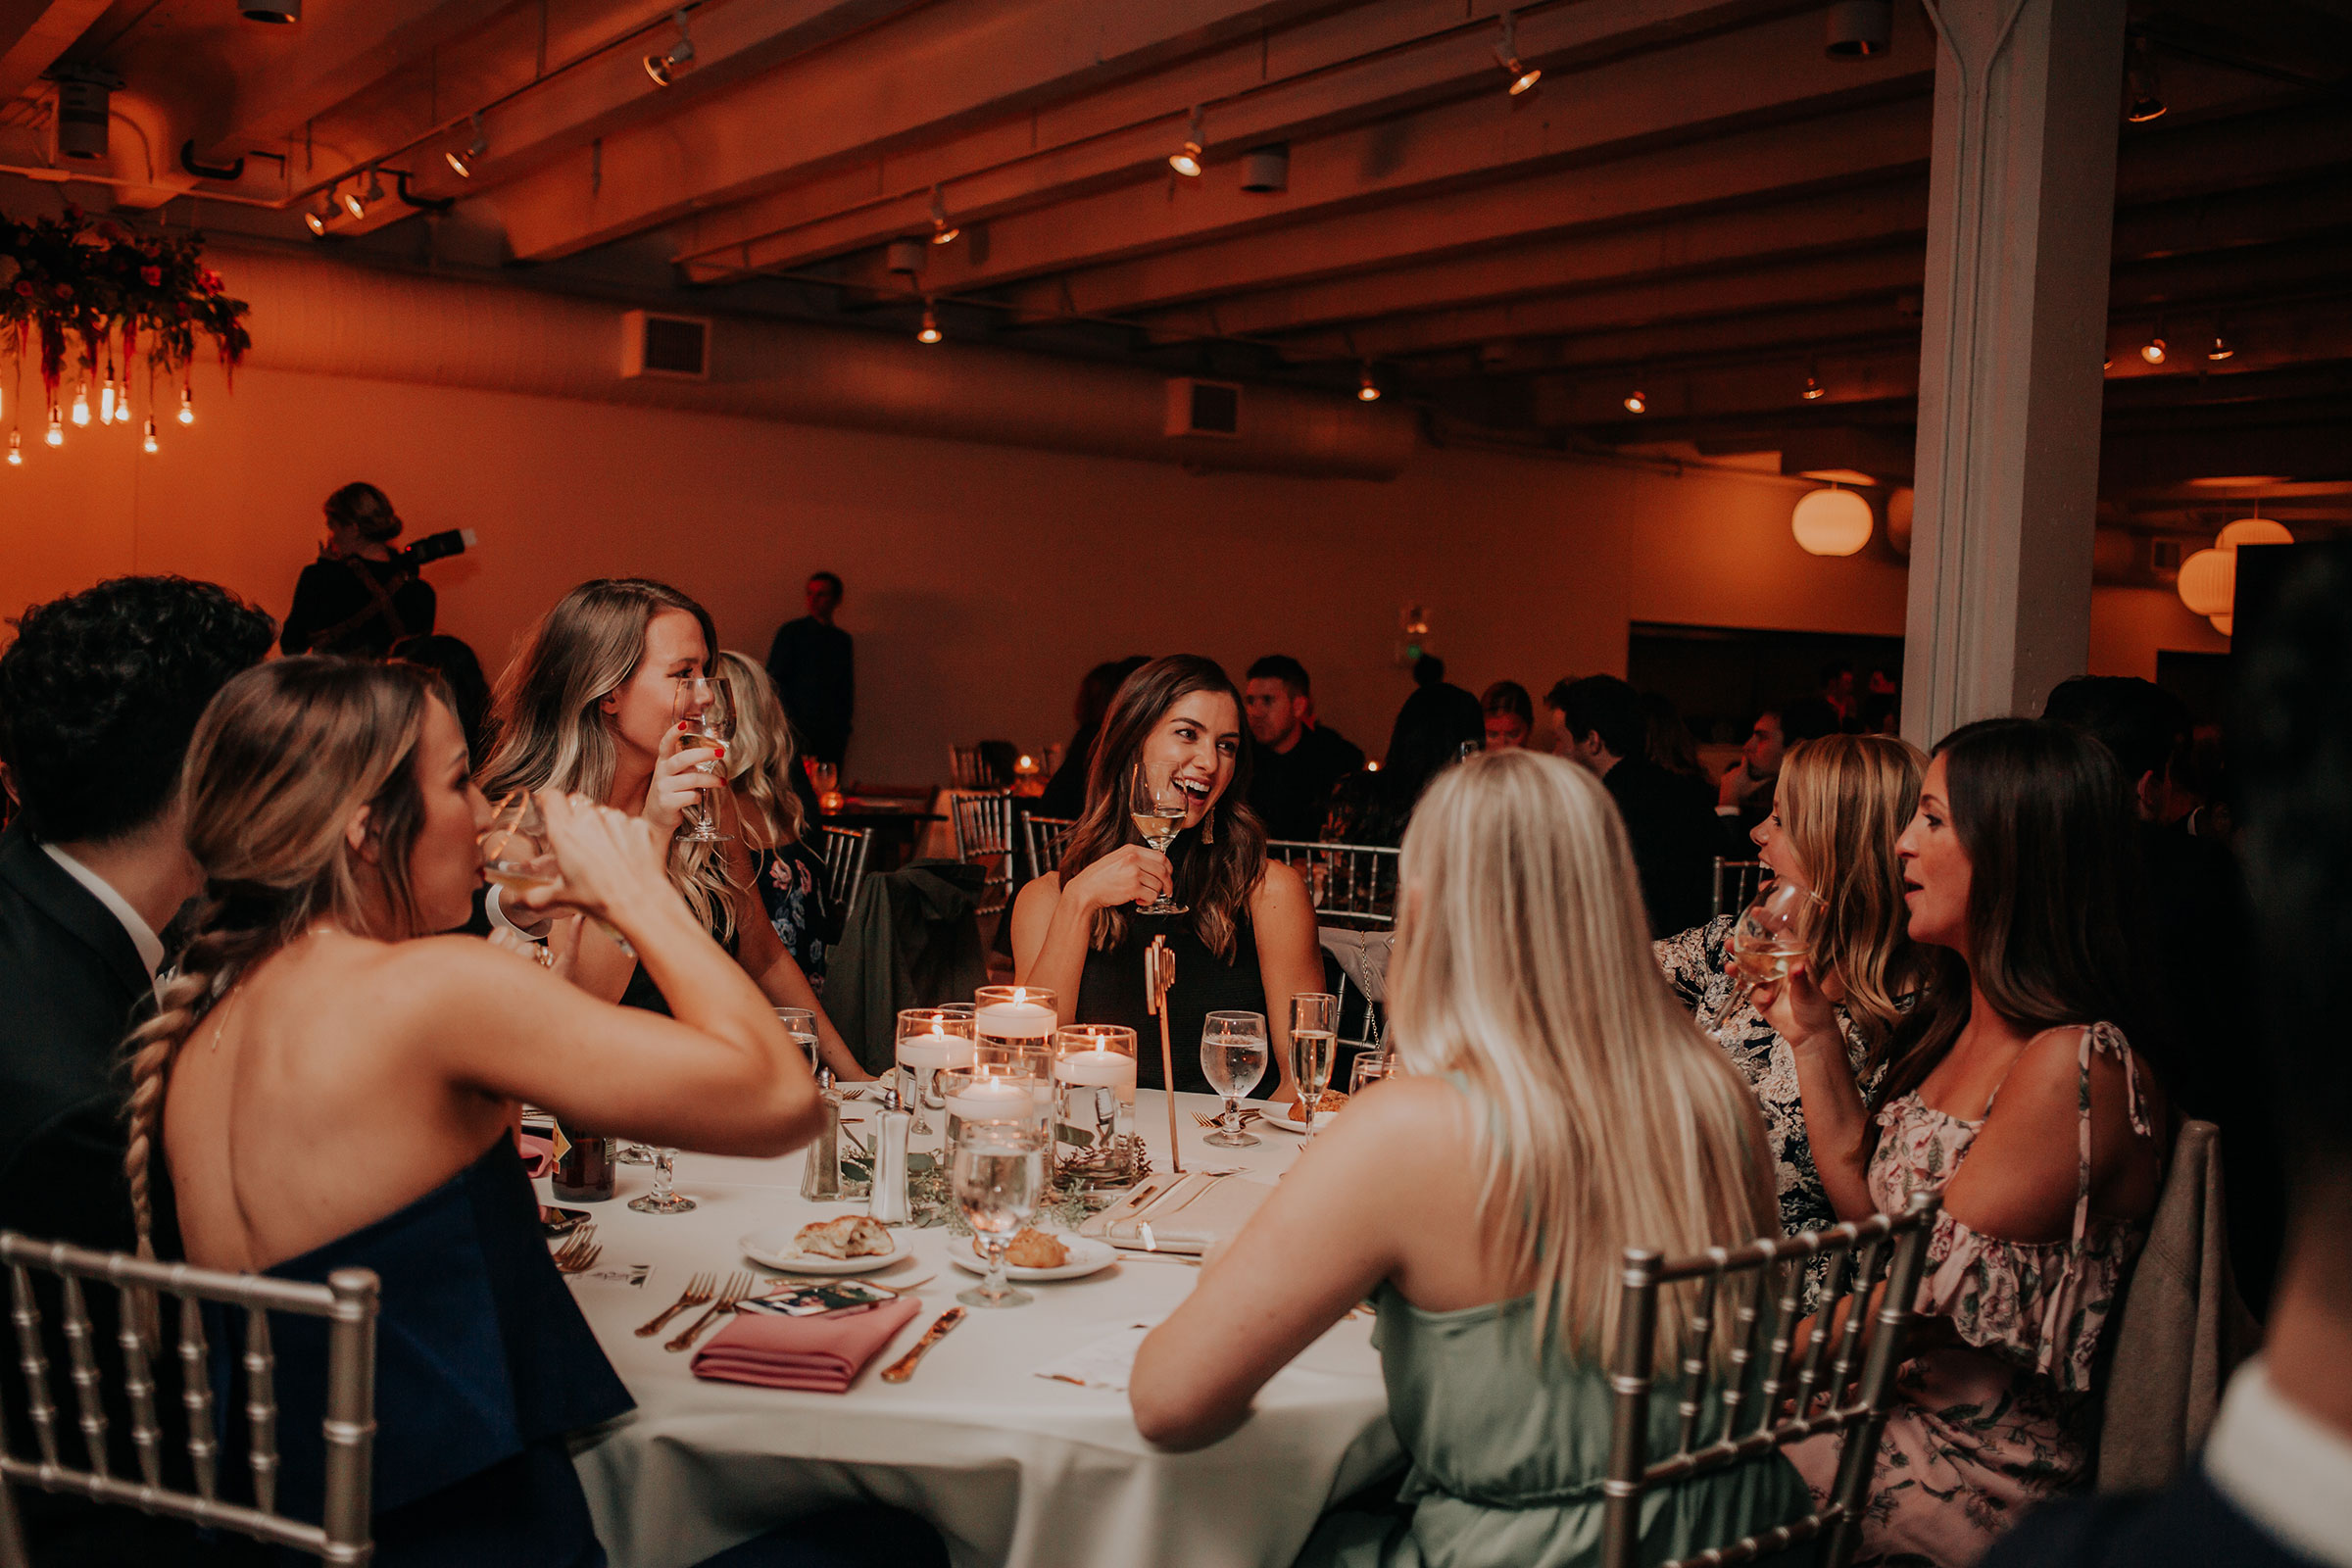 guests-talking-at-round-table-founders-one-nine-omaha-nebraska-raelyn-ramey-photography.jpg